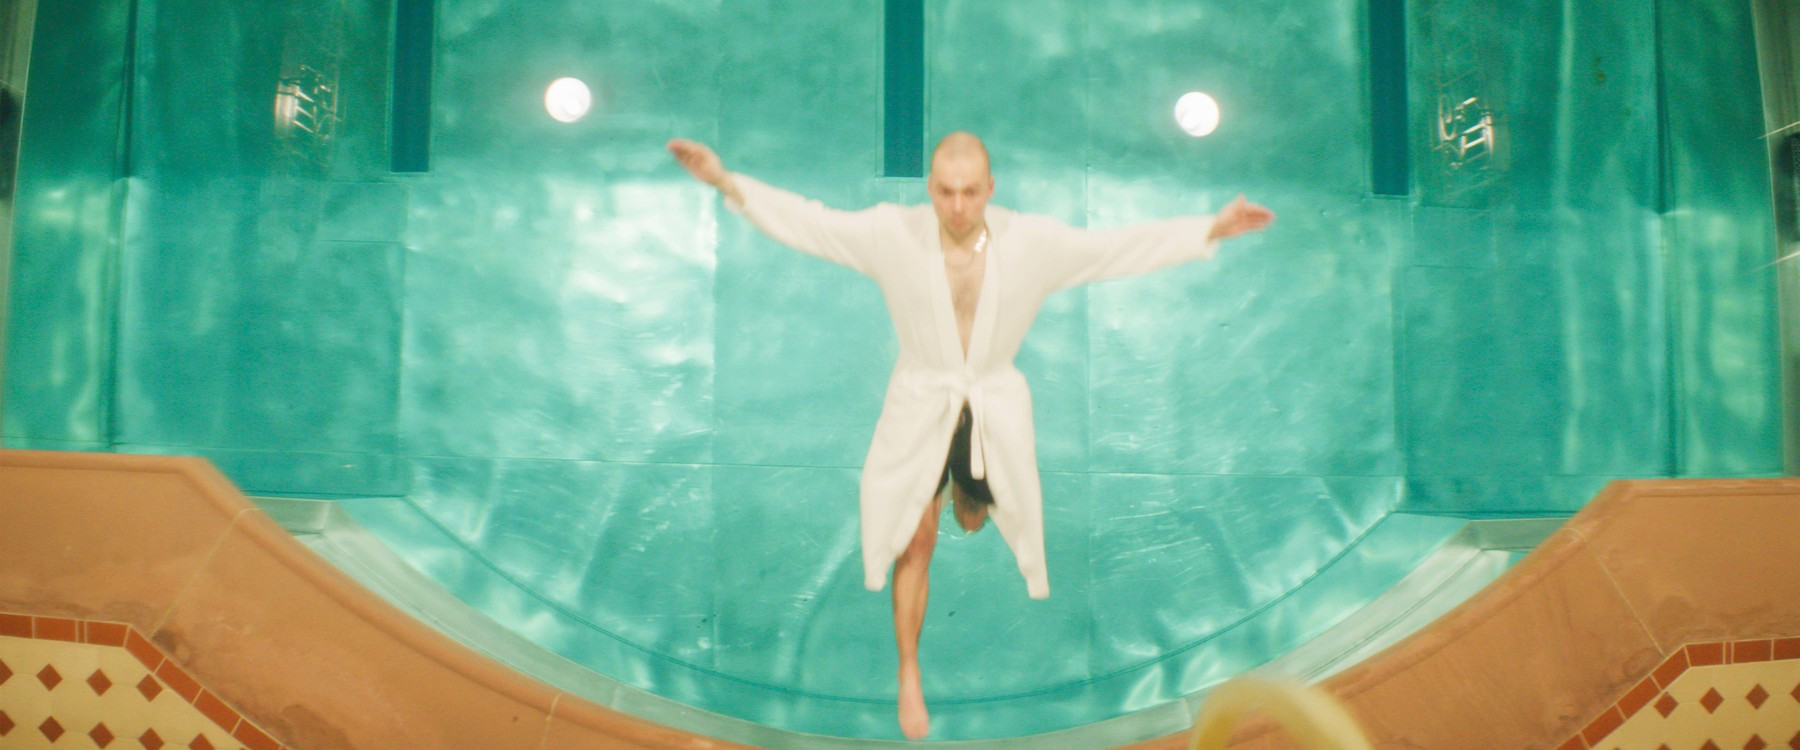 ERRDEKA lässt sich fallen im Musikvideo Kopf im Sand Filmproduktion